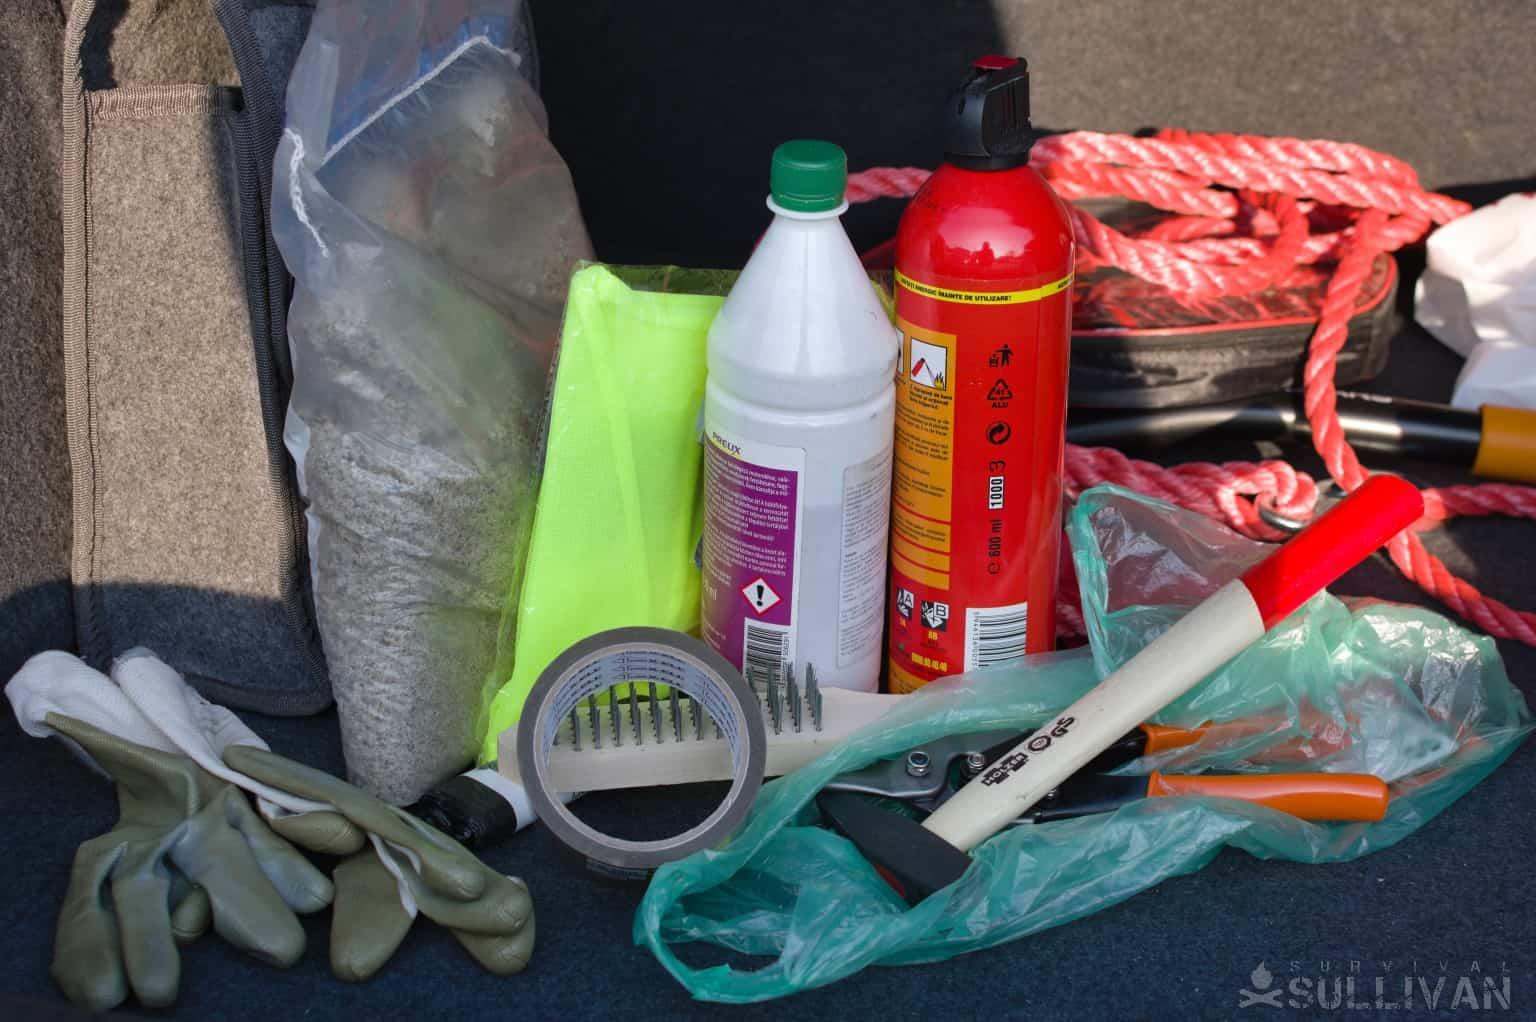 fire extinguisher antifreeze reflective vest hammer gloves duct tape